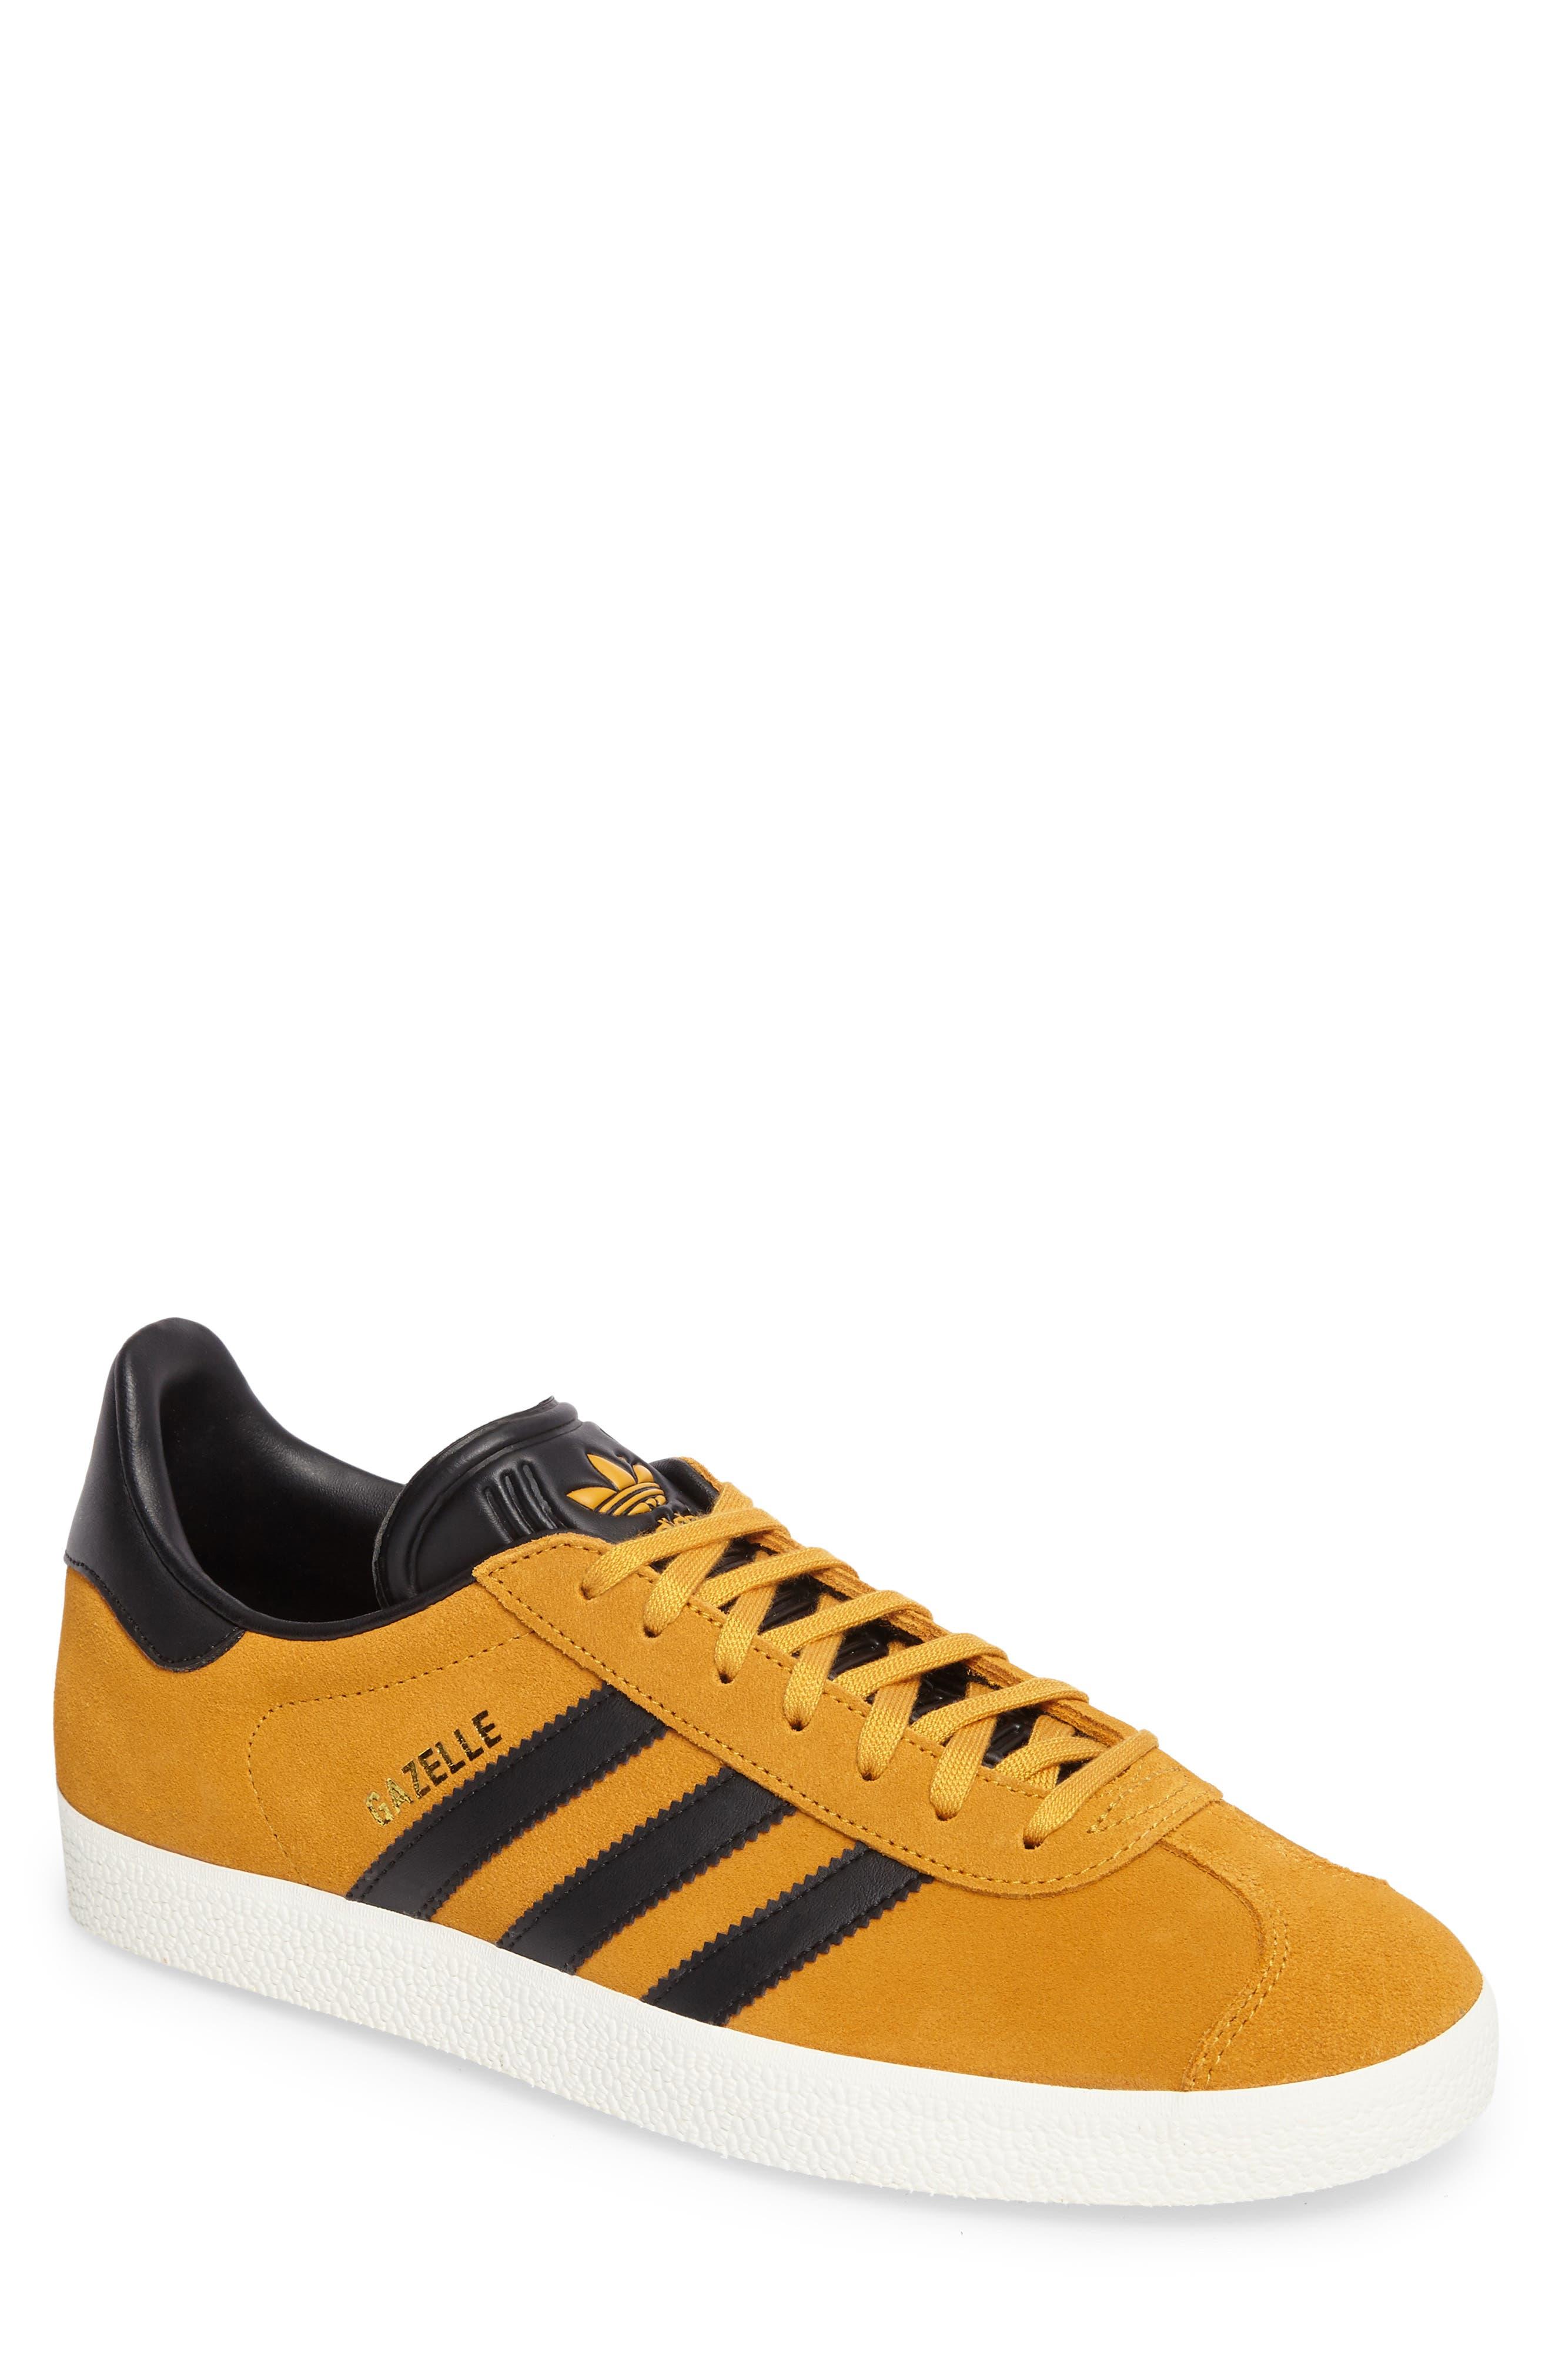 Gazelle Sneaker,                             Main thumbnail 1, color,                             Yellow/ Core Black/ Gold